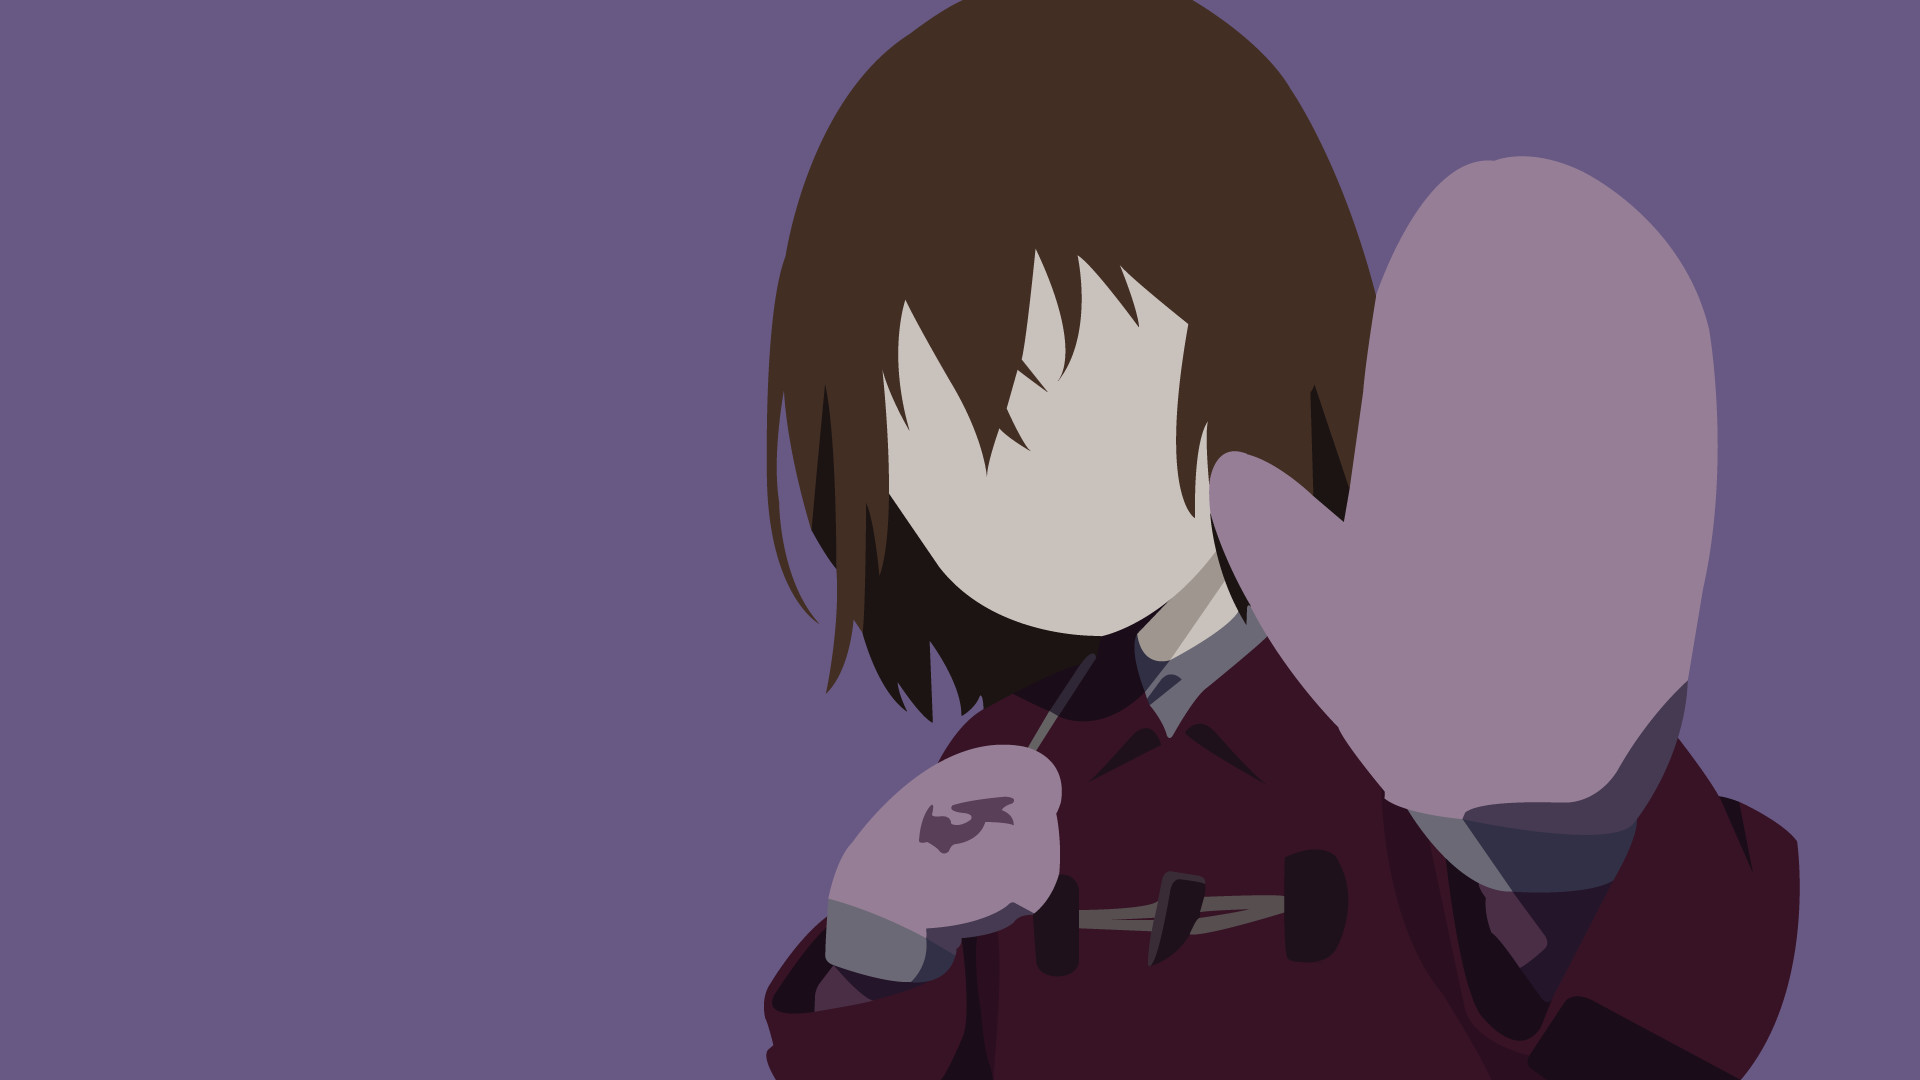 Anime Wallpapers Boku Dake Ga Inai Machi HD 4K Download For Mobile iPhone &  PC